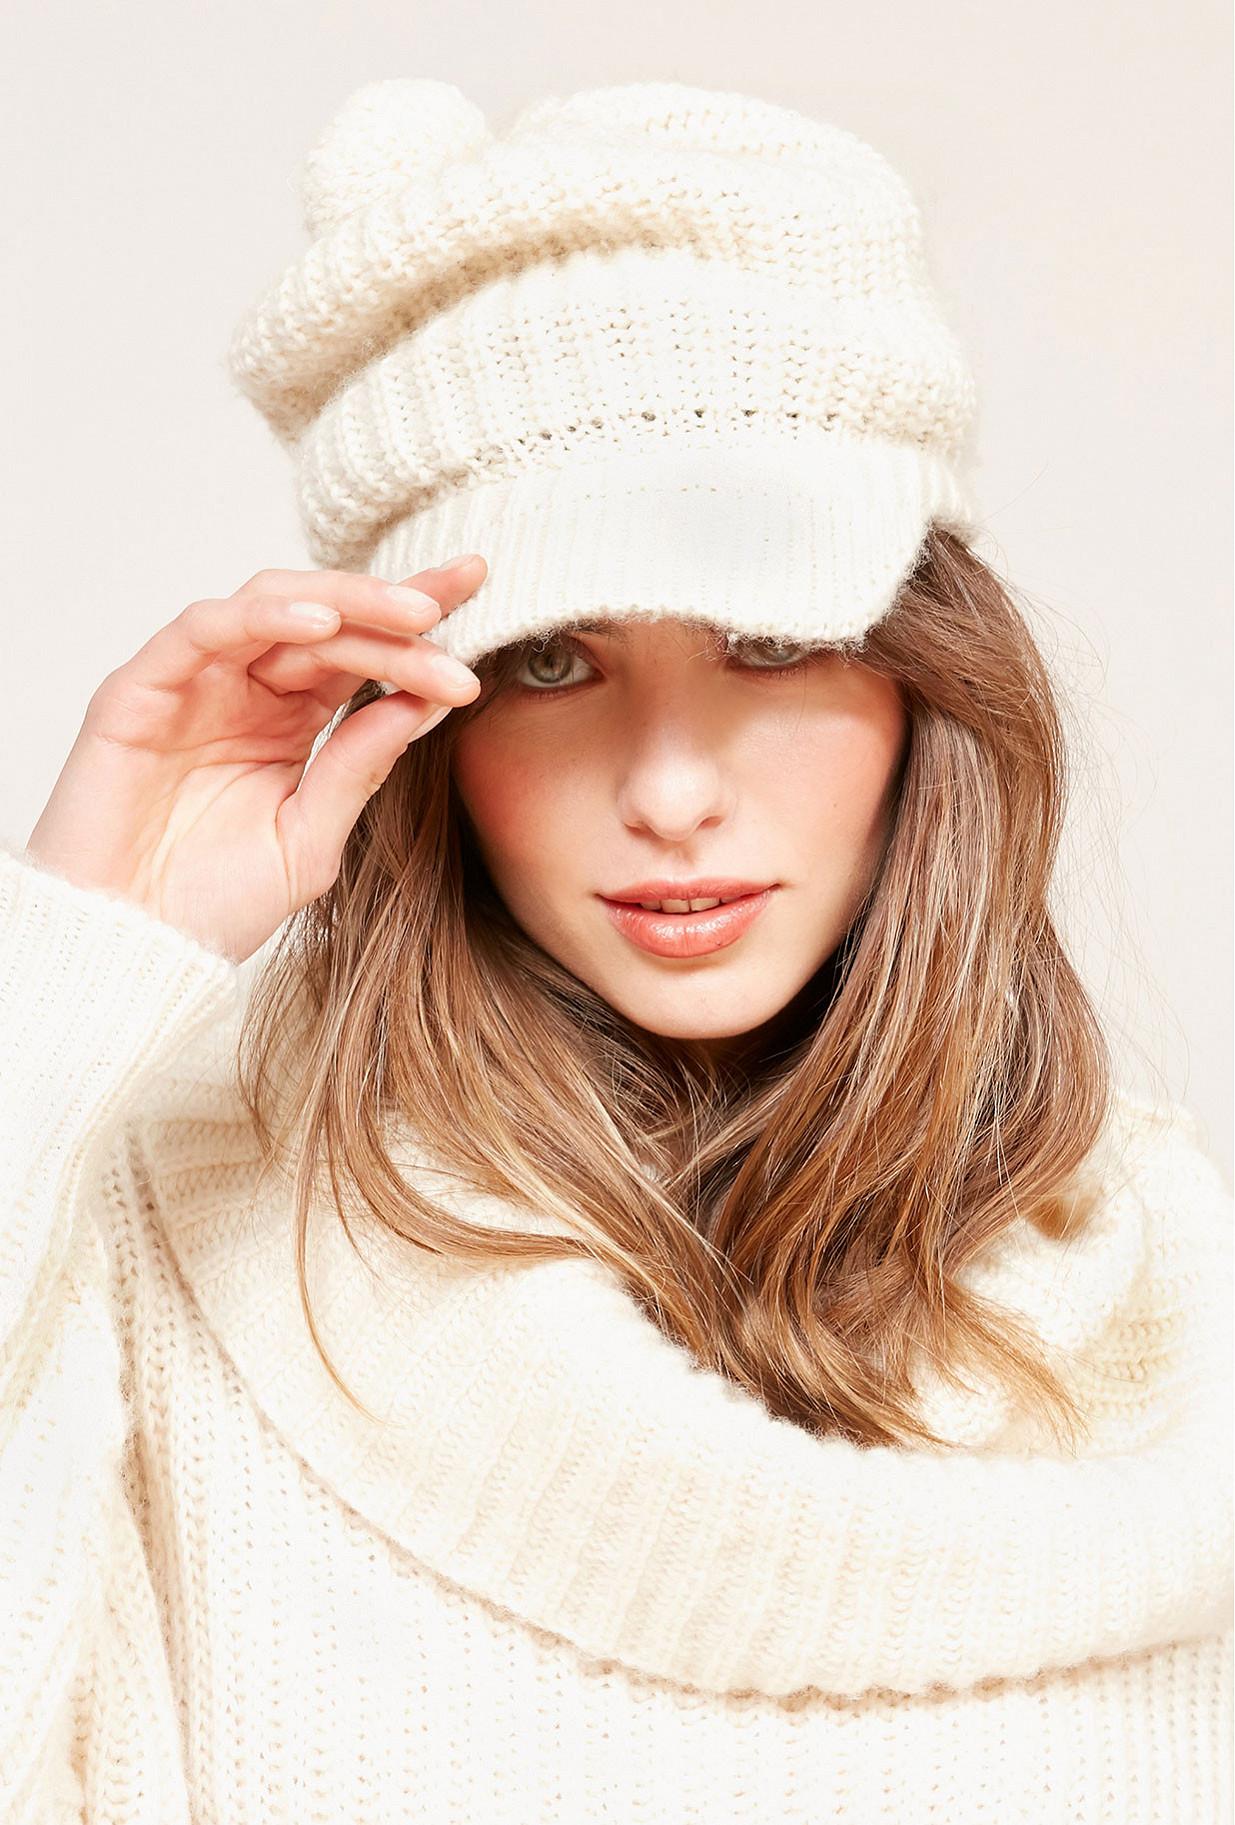 Paris clothes store Beanie  Wolf french designer fashion Paris